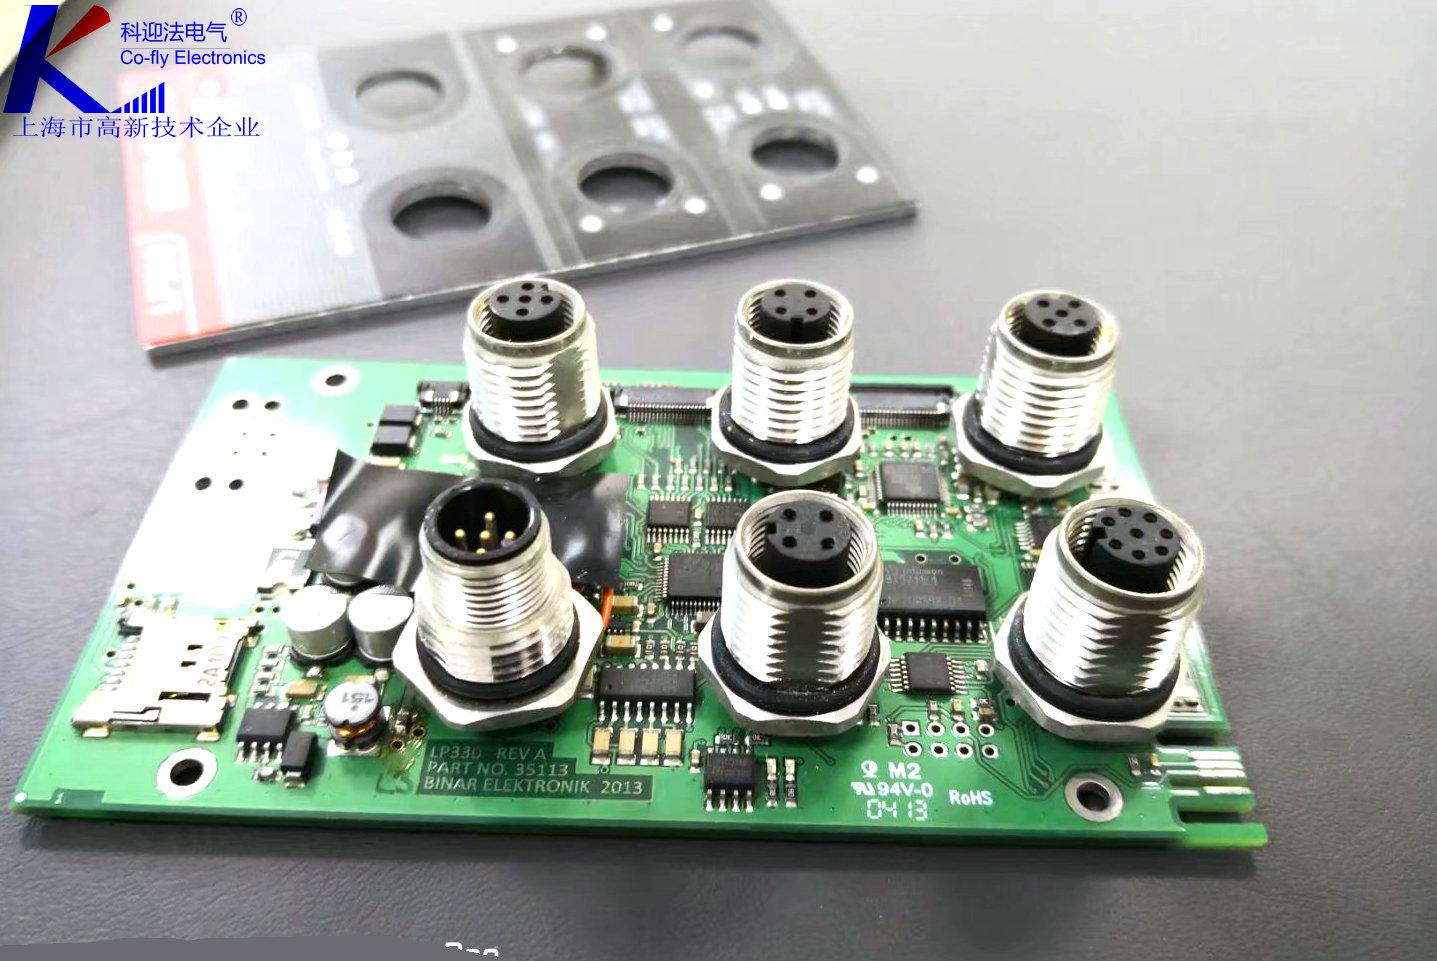 profinet航空插头插座遮蔽体  遮蔽体能屏蔽保护来自电磁的辐射干扰。即通过限制使电磁辐射反在其产生的区域内,或屏蔽来自外部的电磁干扰。